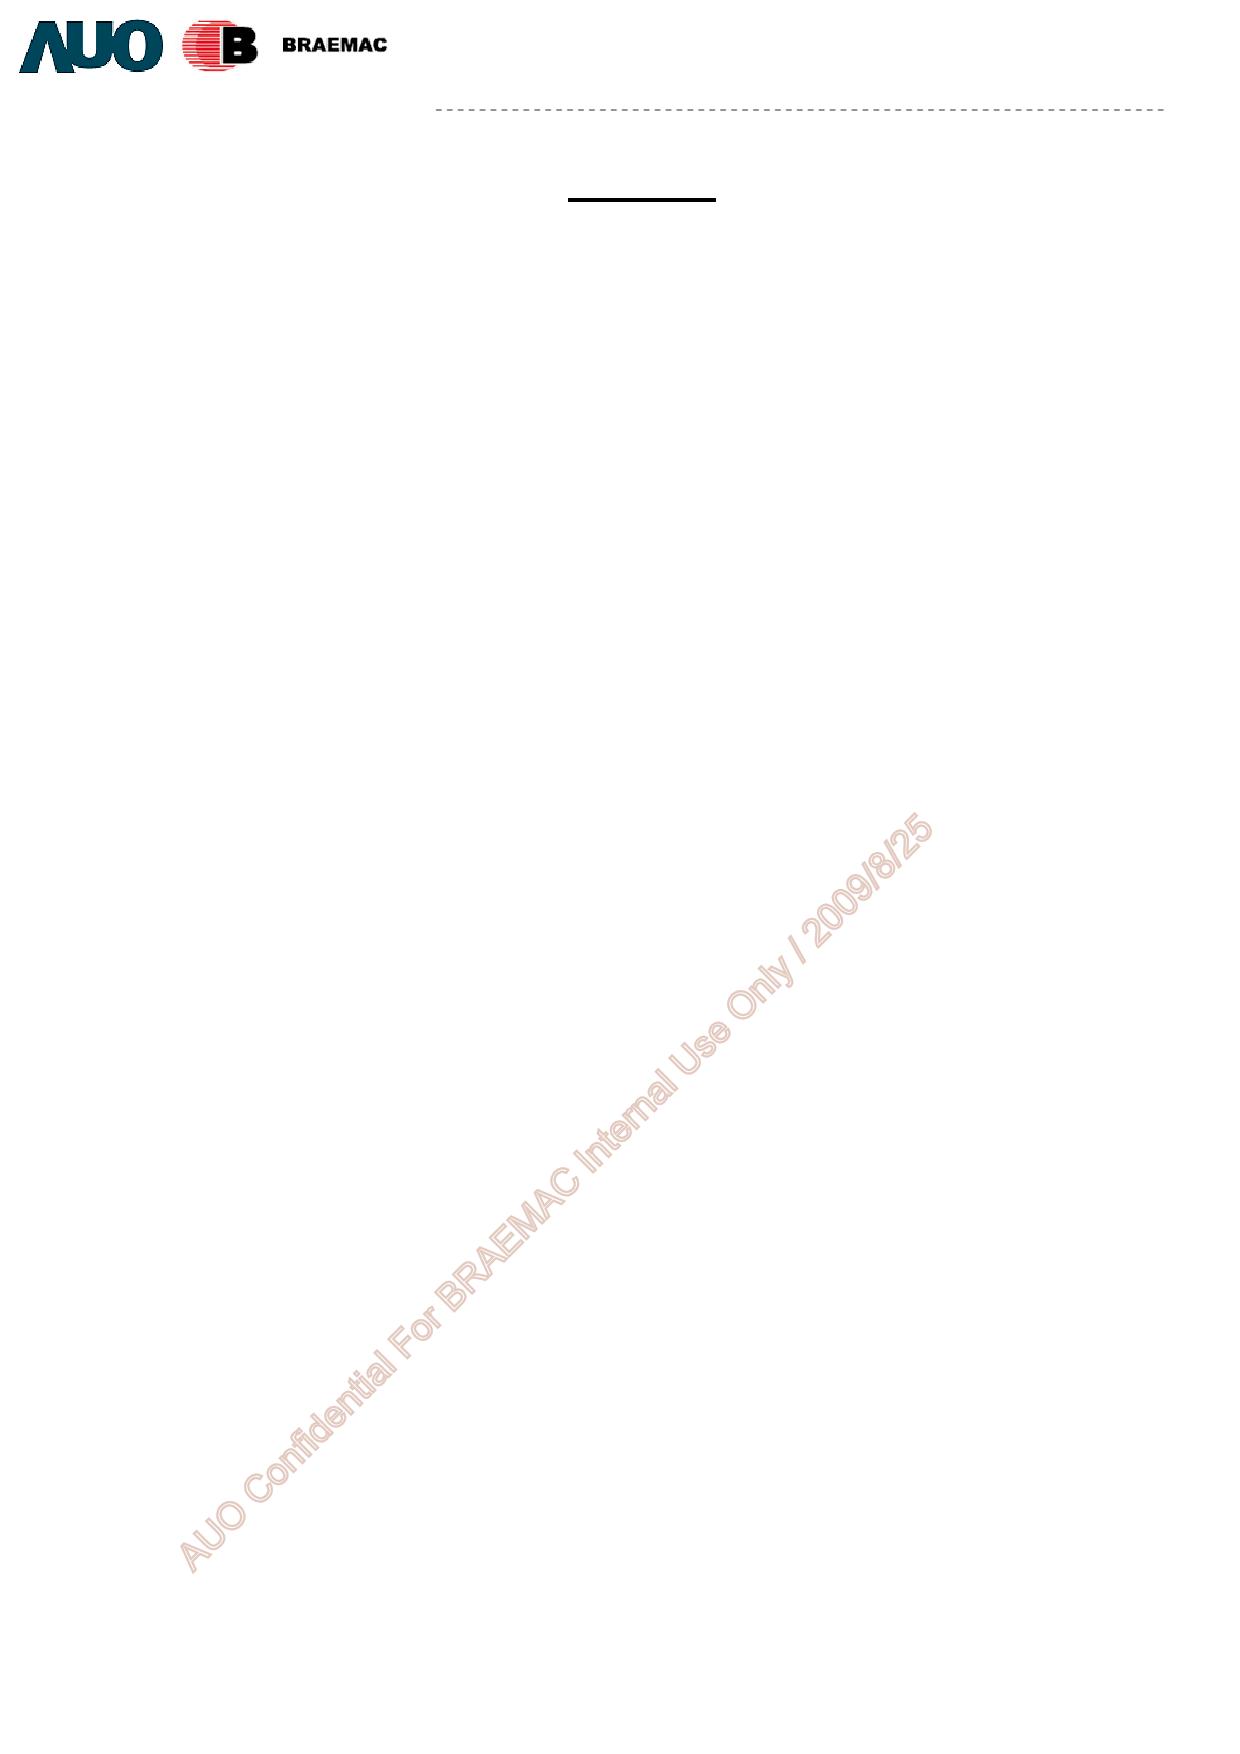 G070VW01 Даташит, Описание, Даташиты